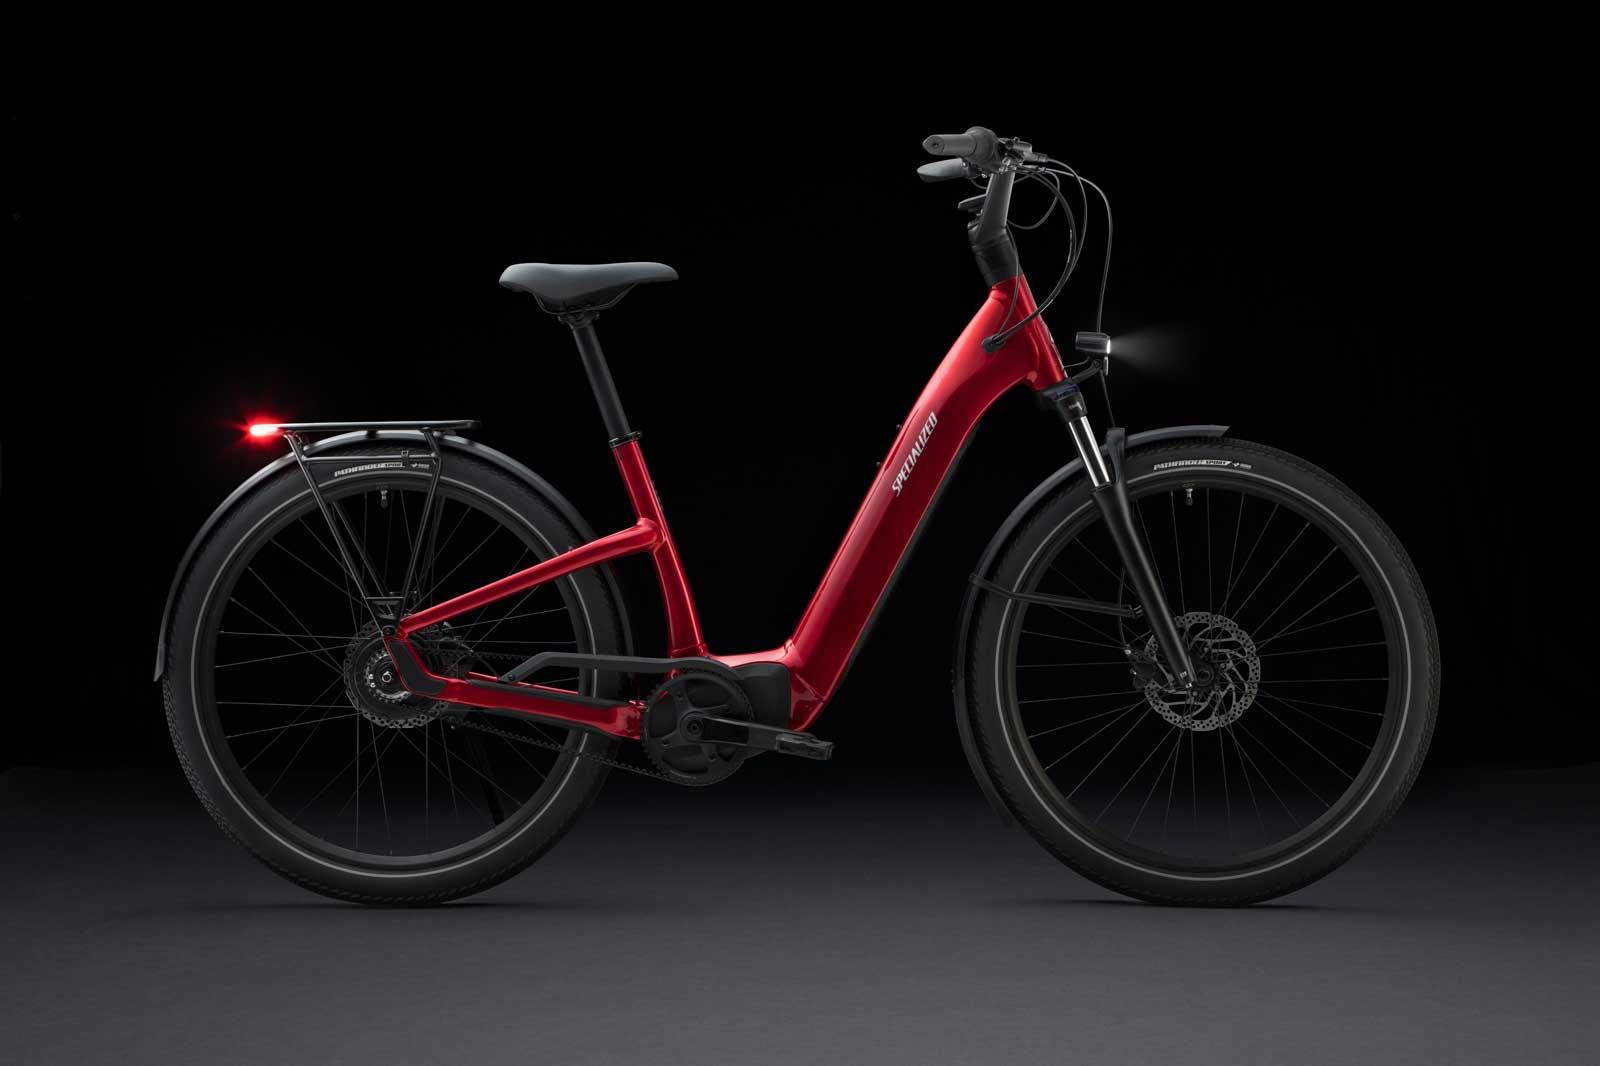 2022 specialized turbo como ebike red